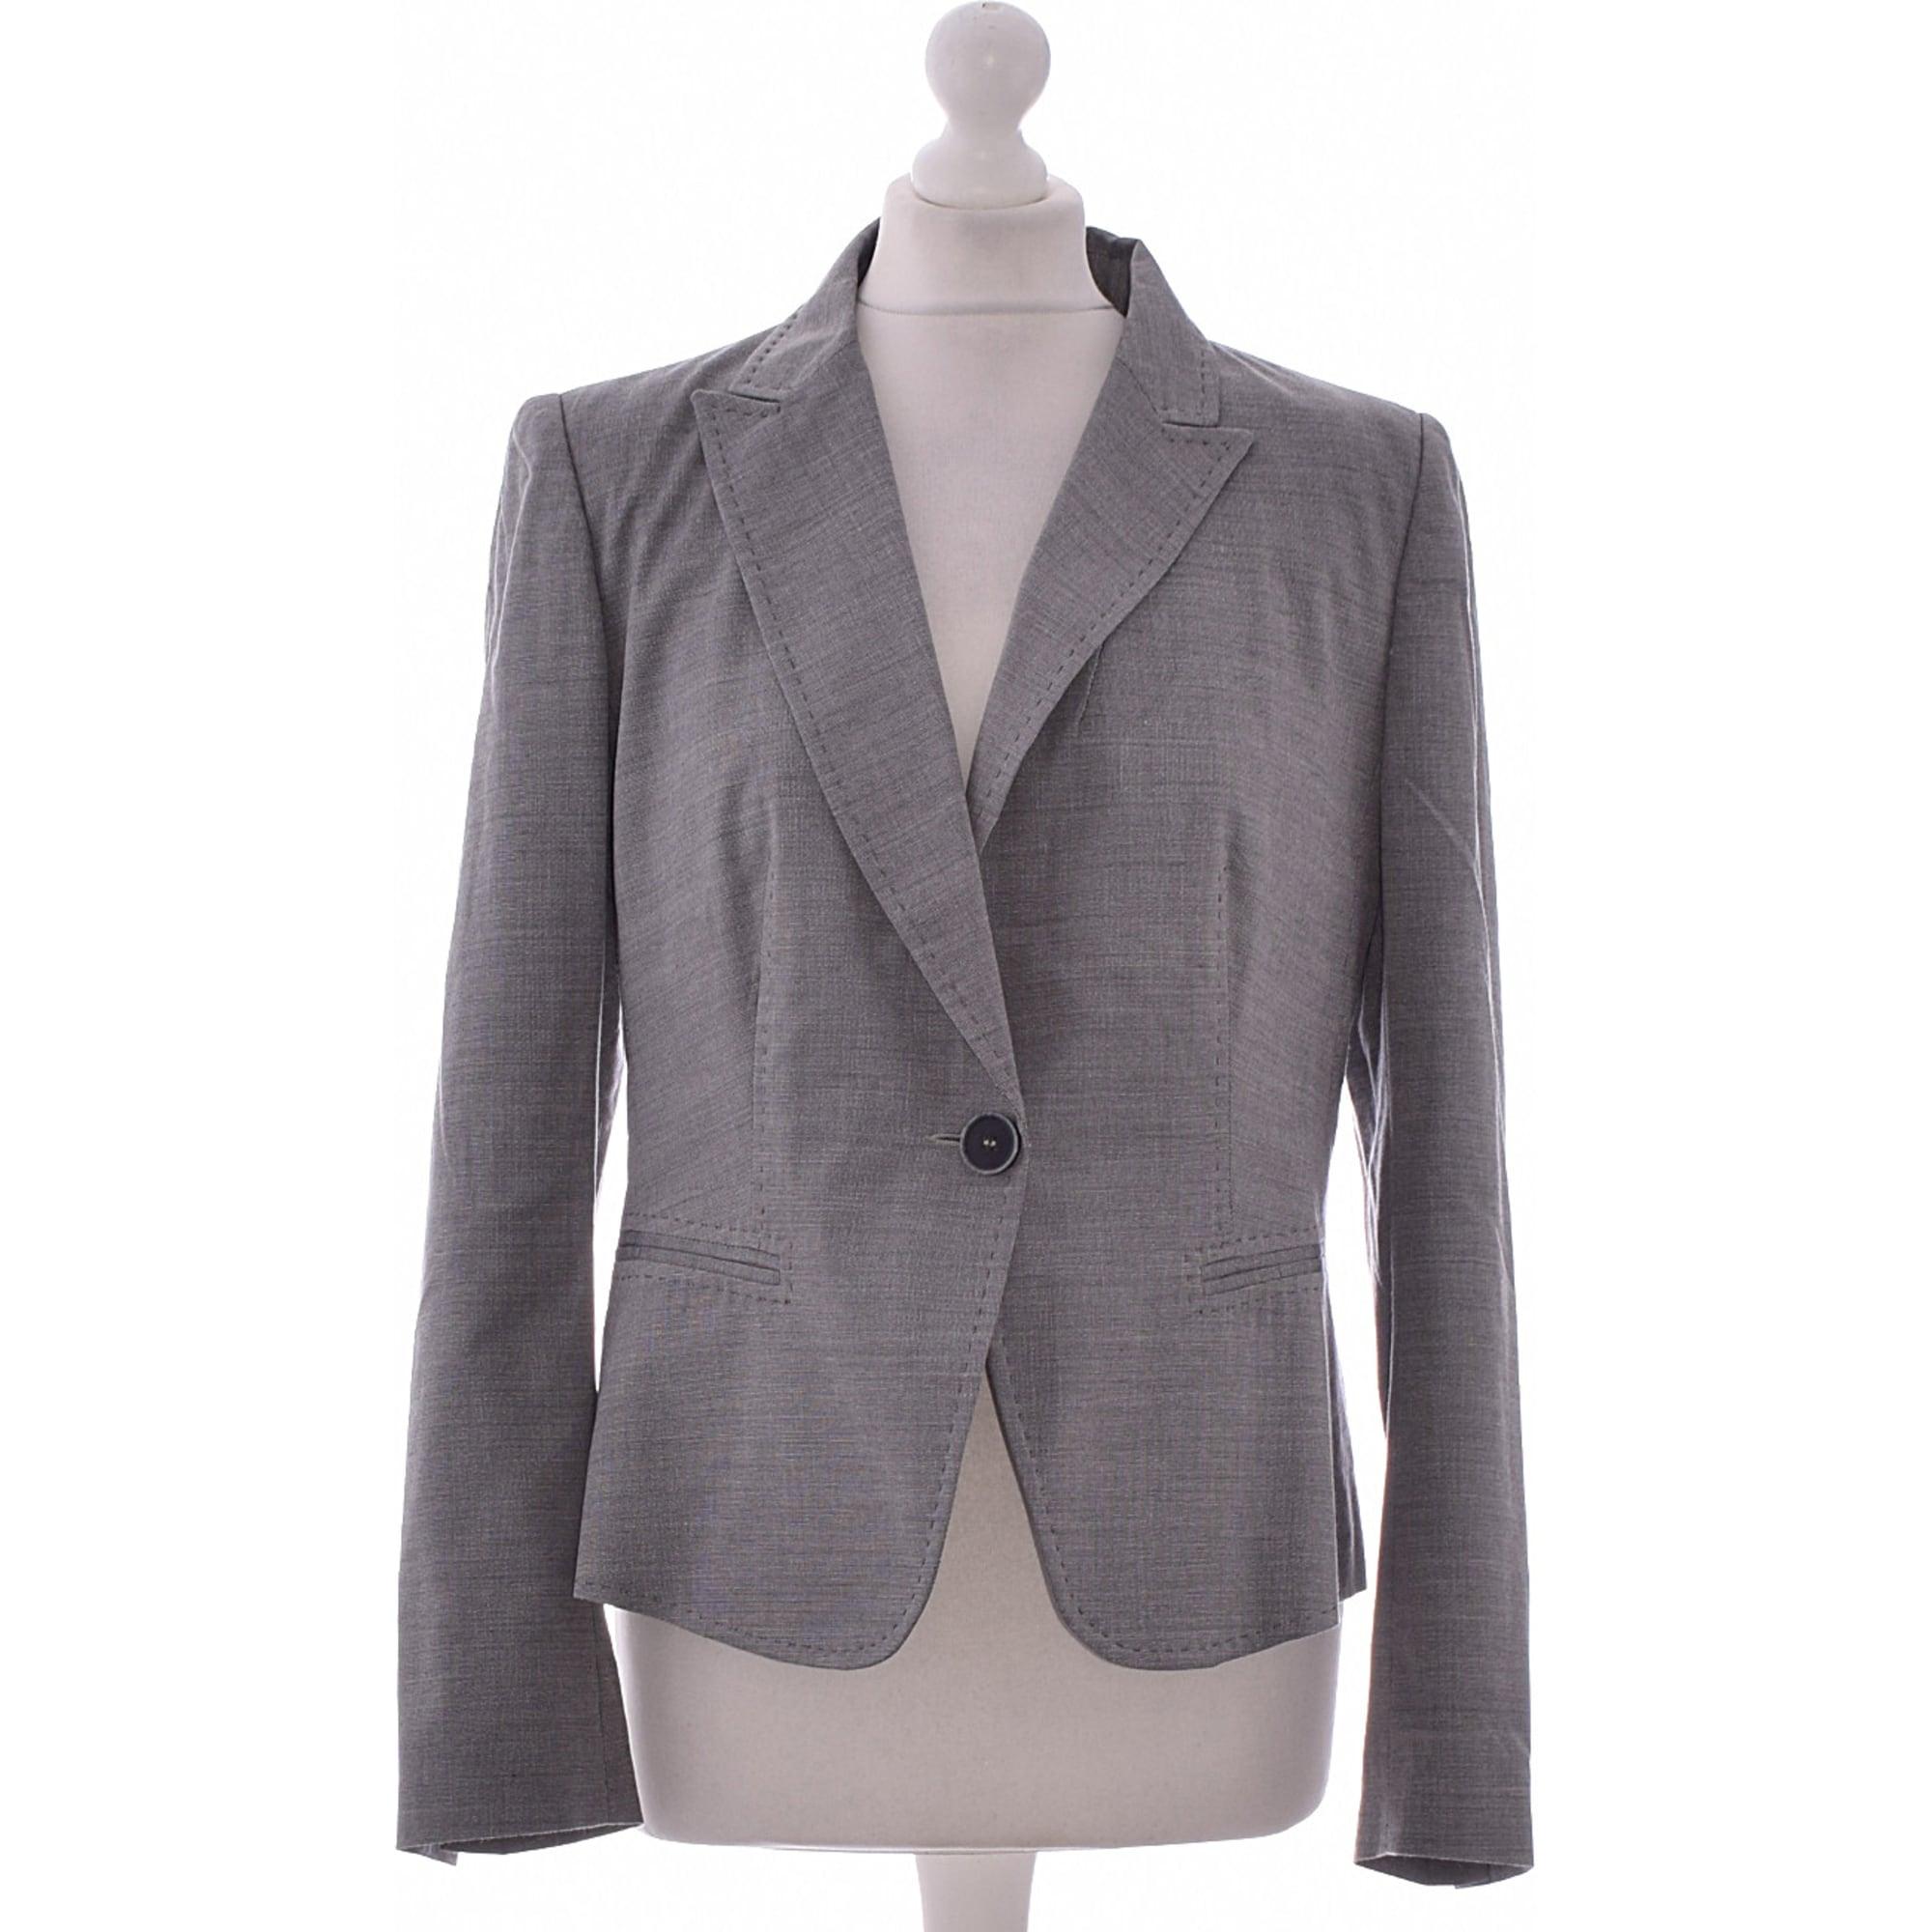 Blazer, veste tailleur CAROLL 42 (L XL, T4) gris - 7286073 1f34544fd68